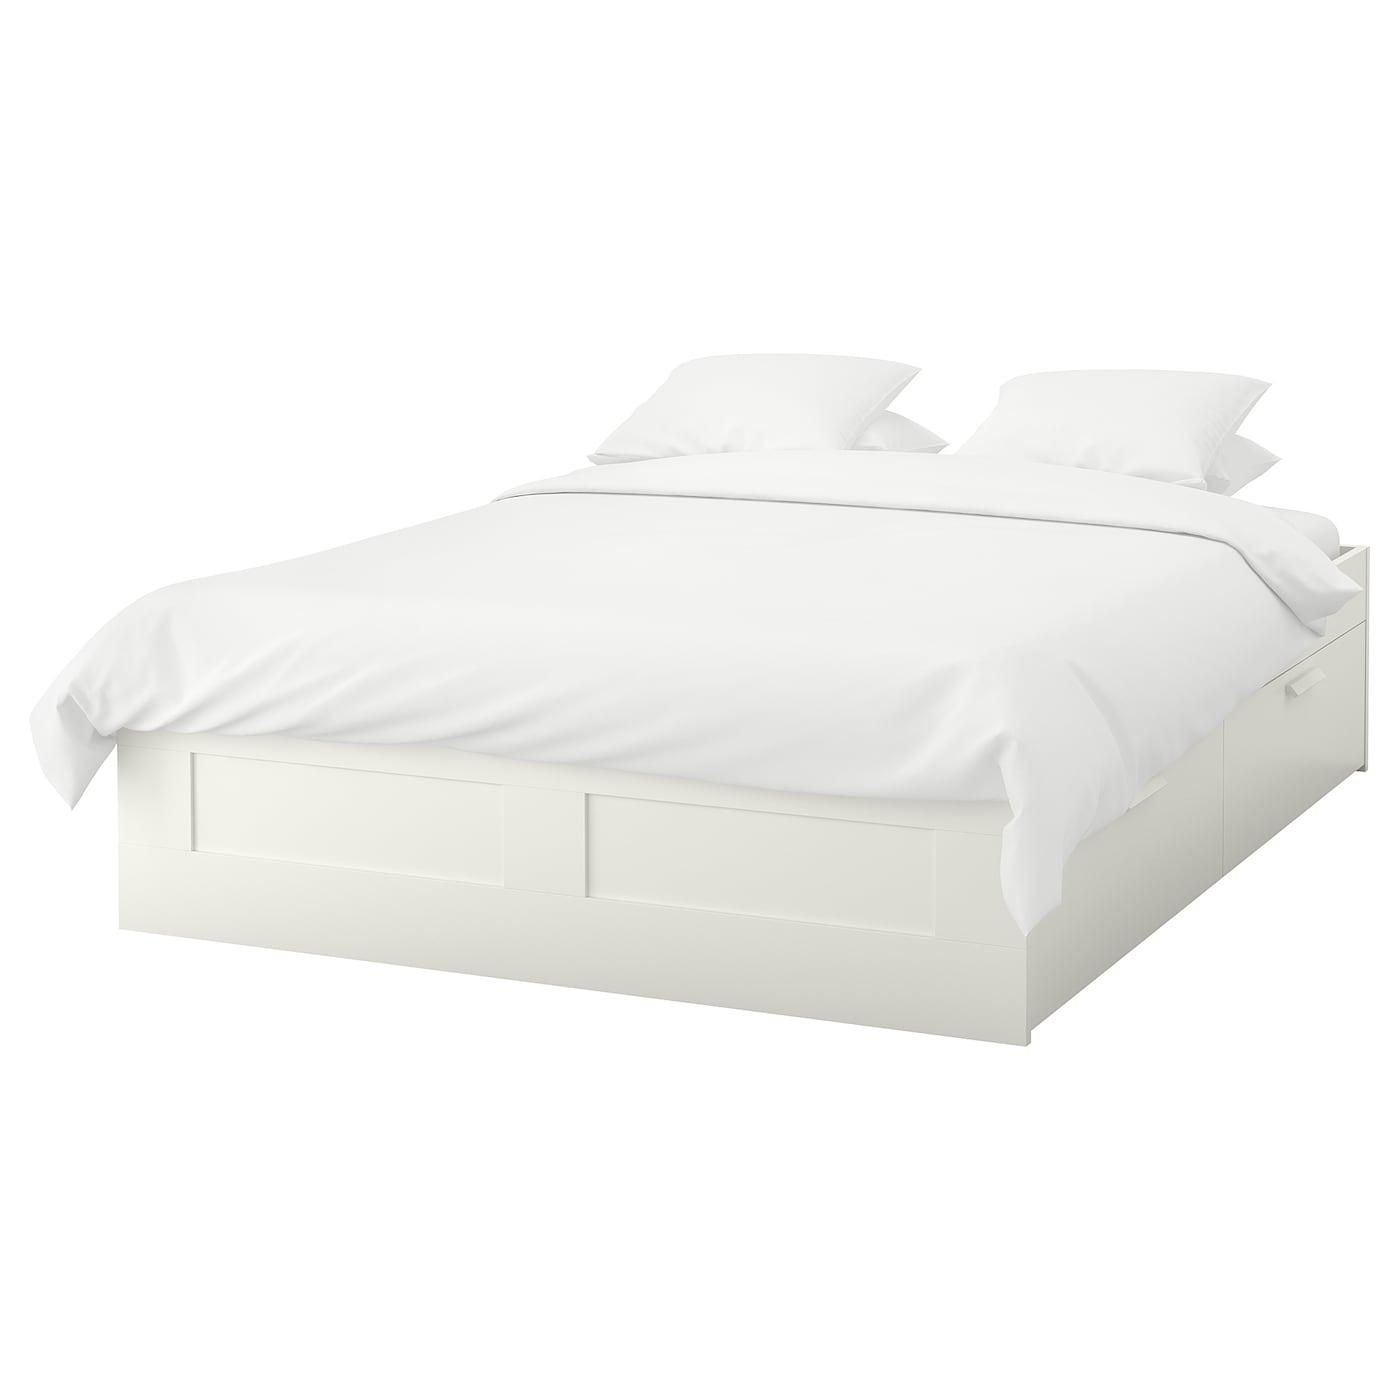 brimnes cadre lit avec rangement blanc lur y 140 x 200 cm ikea. Black Bedroom Furniture Sets. Home Design Ideas